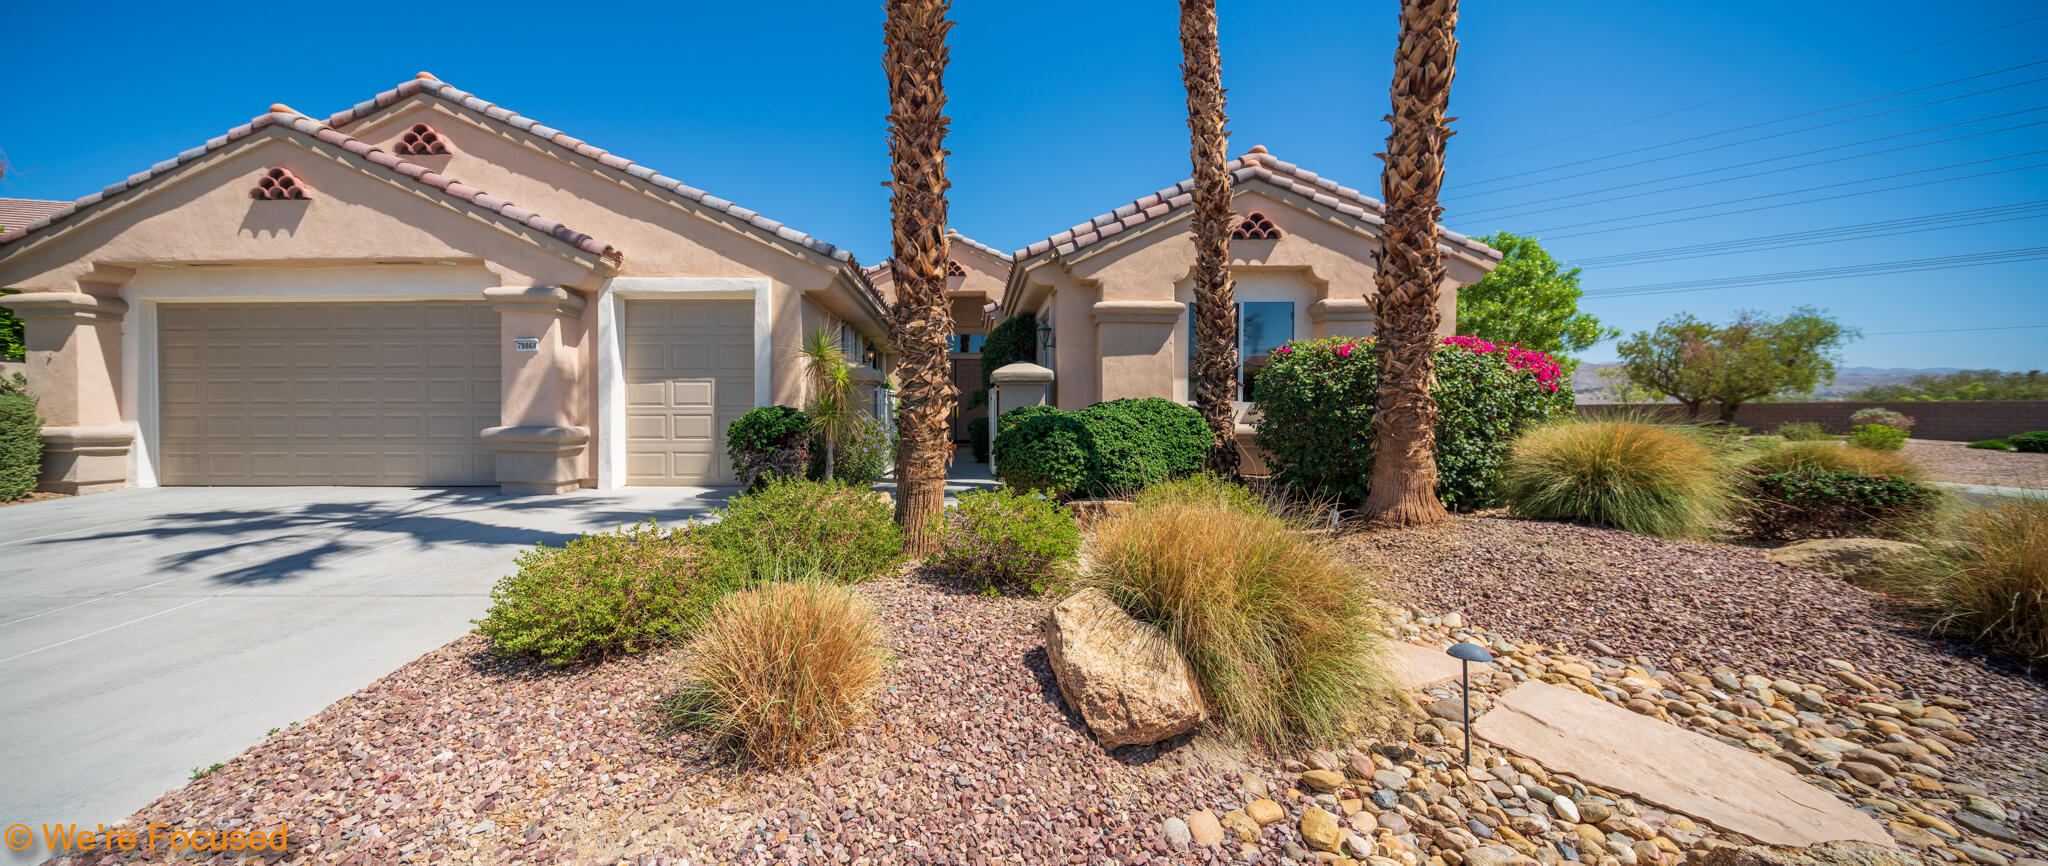 Photo of 78868 Sunrise Canyon Avenue, Palm Desert, CA 92211